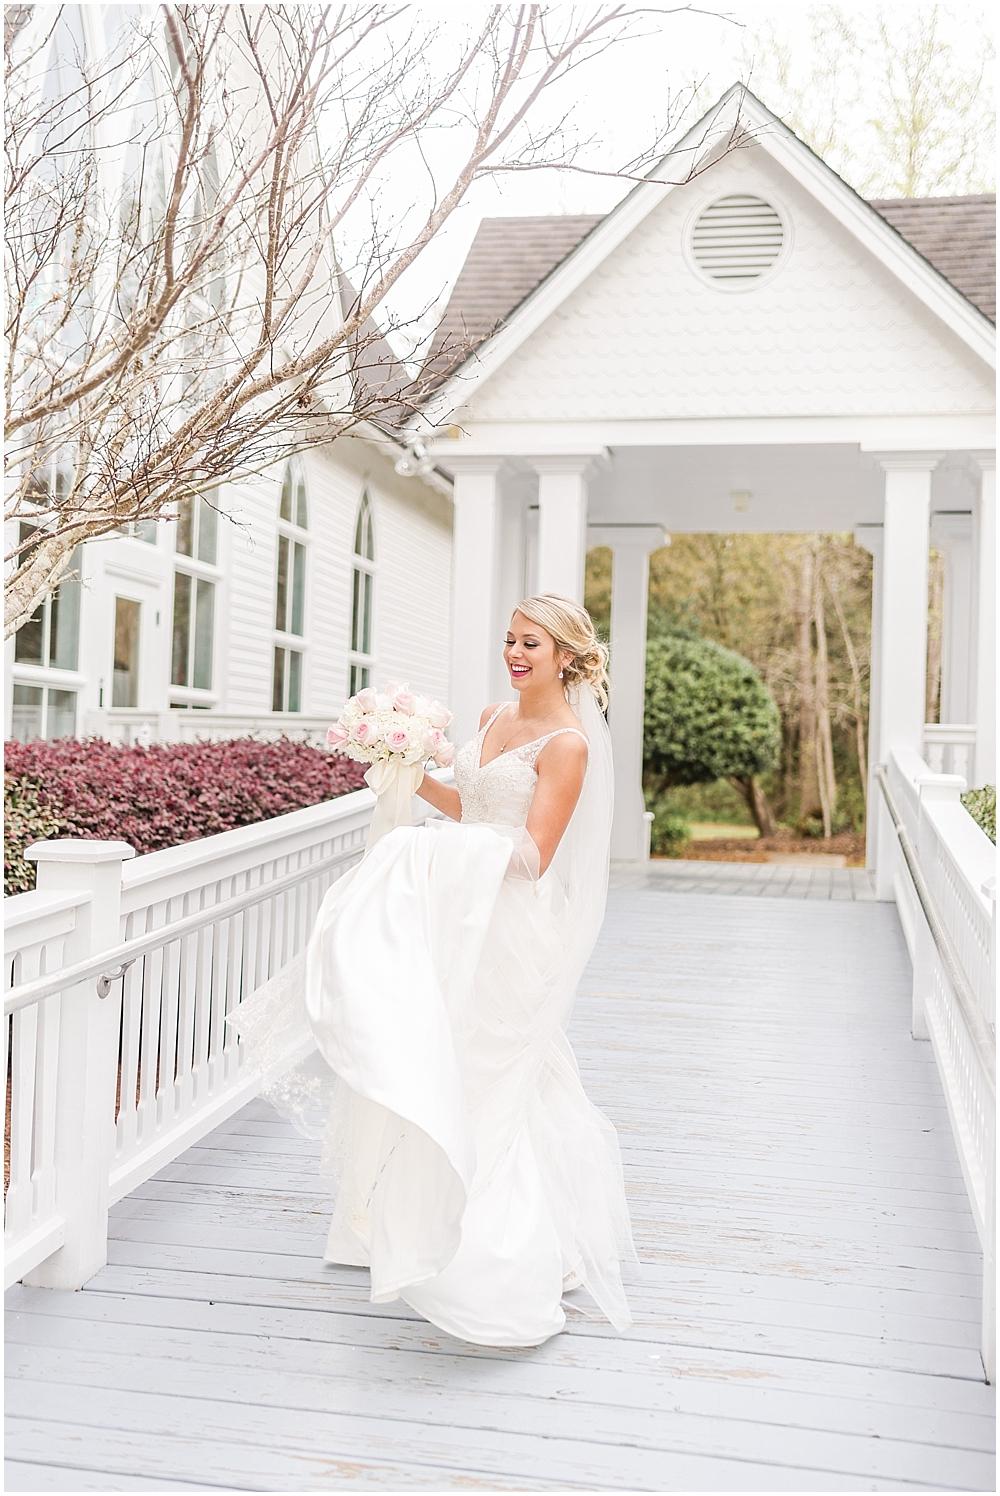 Ashton-Clark-Photography-Wedding-Portrait-Family-Photographer-Mobile-Alabama_0290.jpg